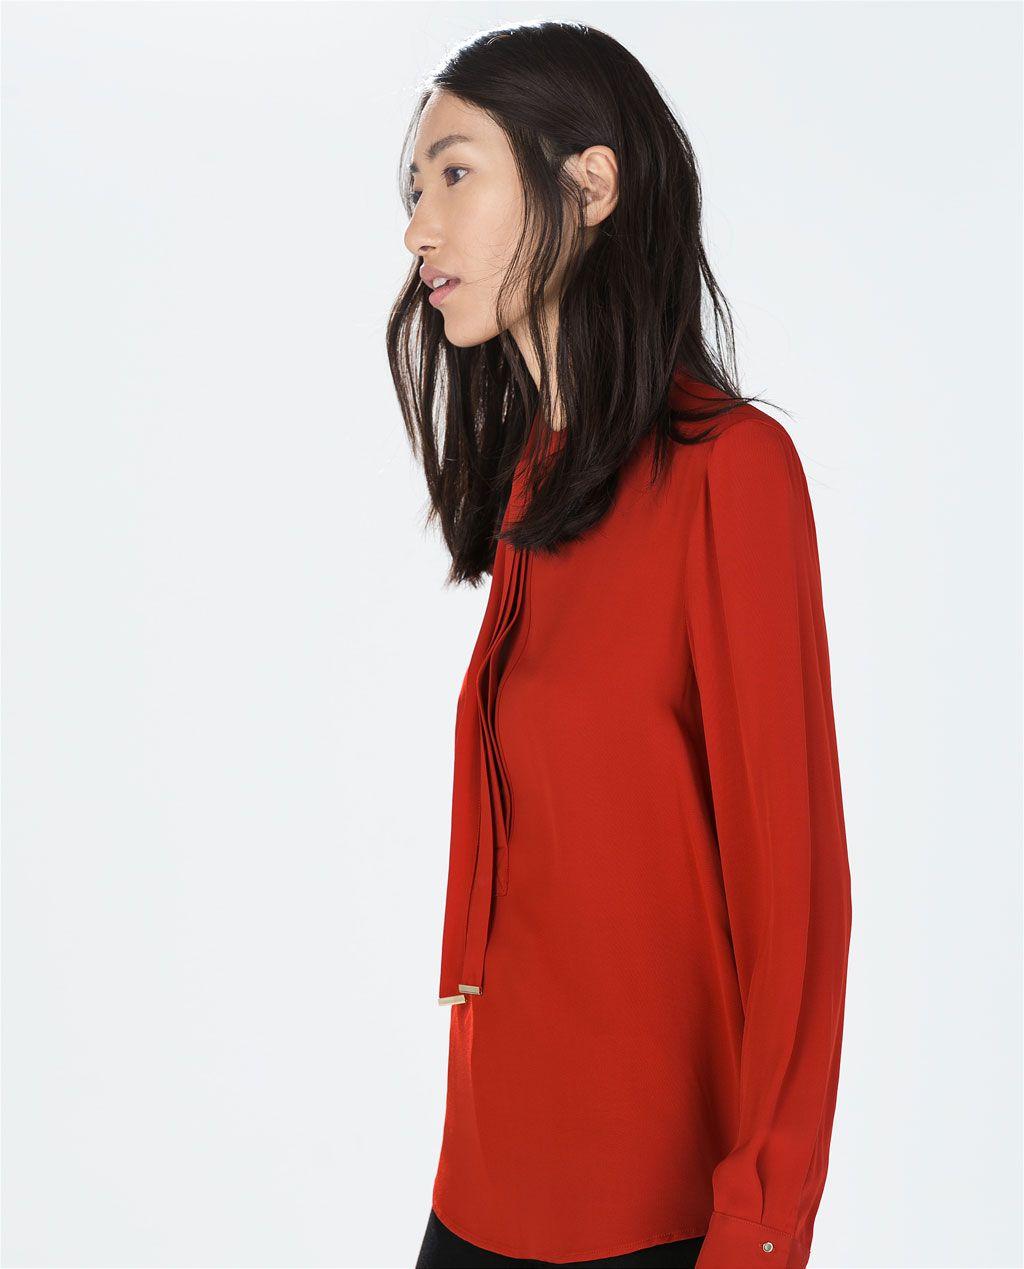 Zara woman bowed blouse styles and smartsuethursdayus treasures